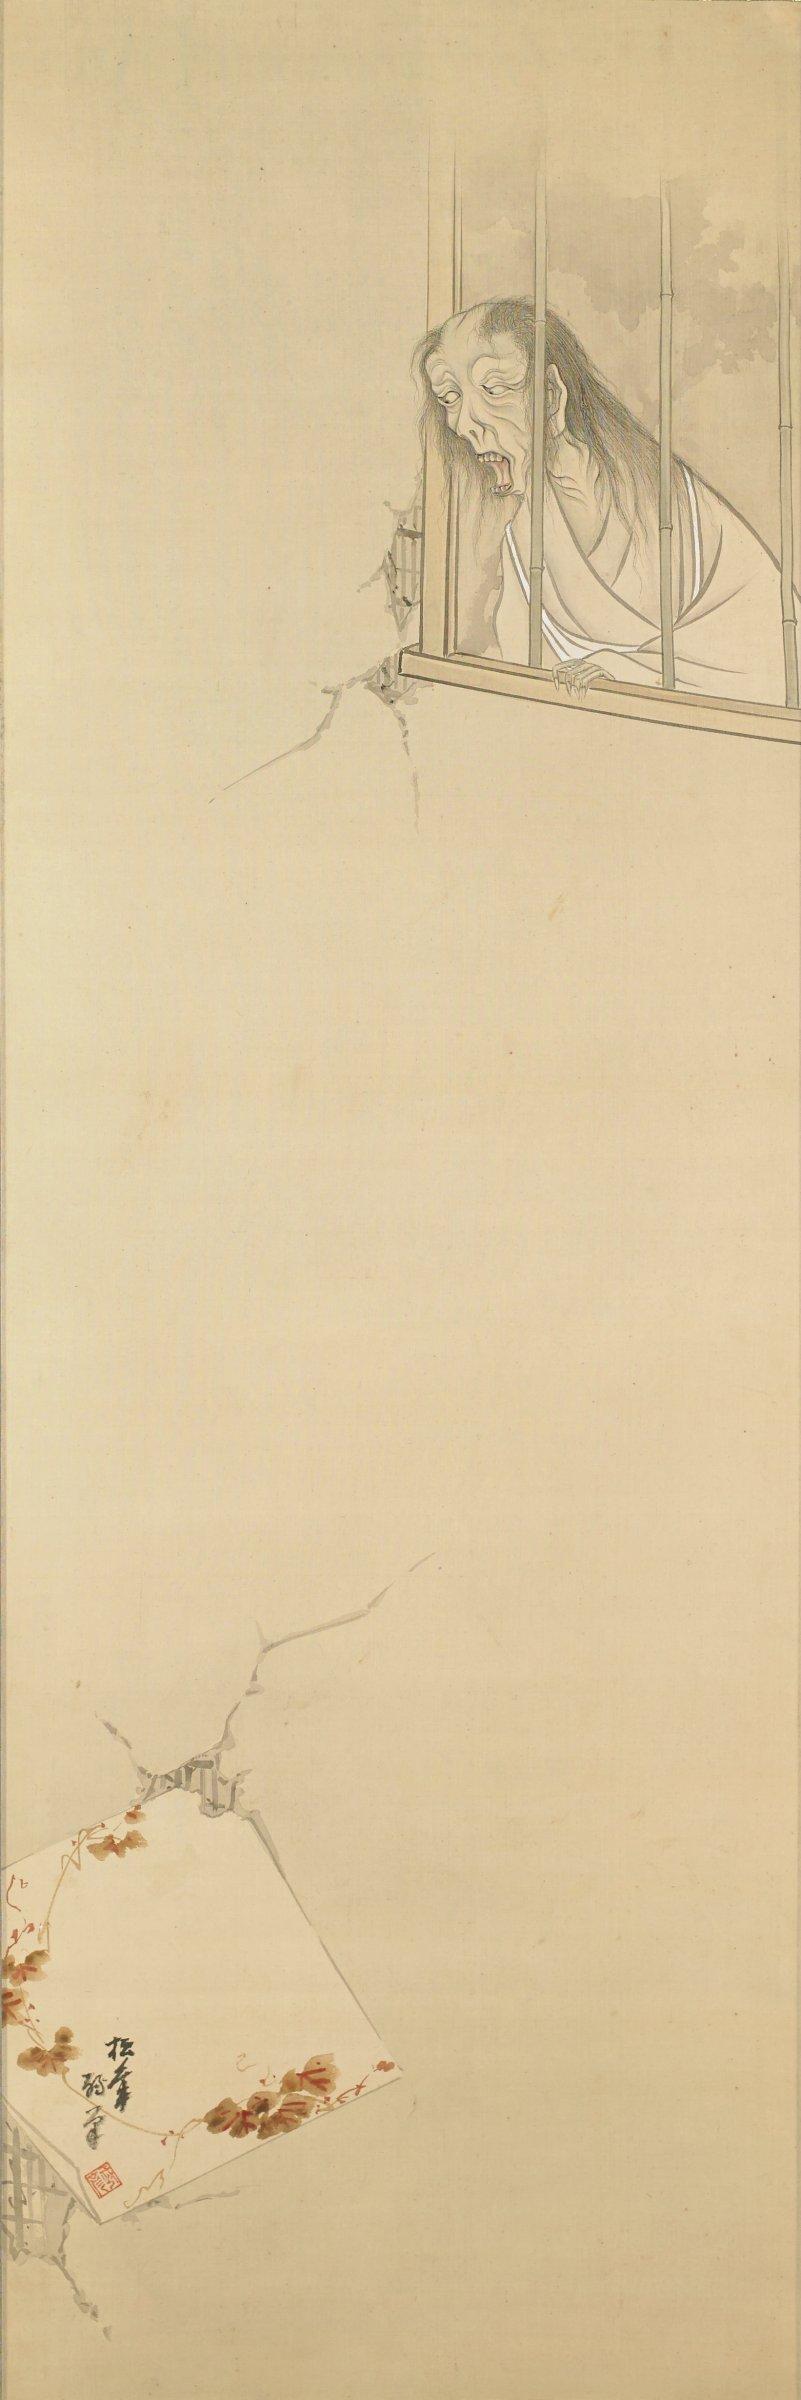 The Ghost of Oiwa (Yotsuya Kaidan), Suzuki Shonen, ink and color on paper